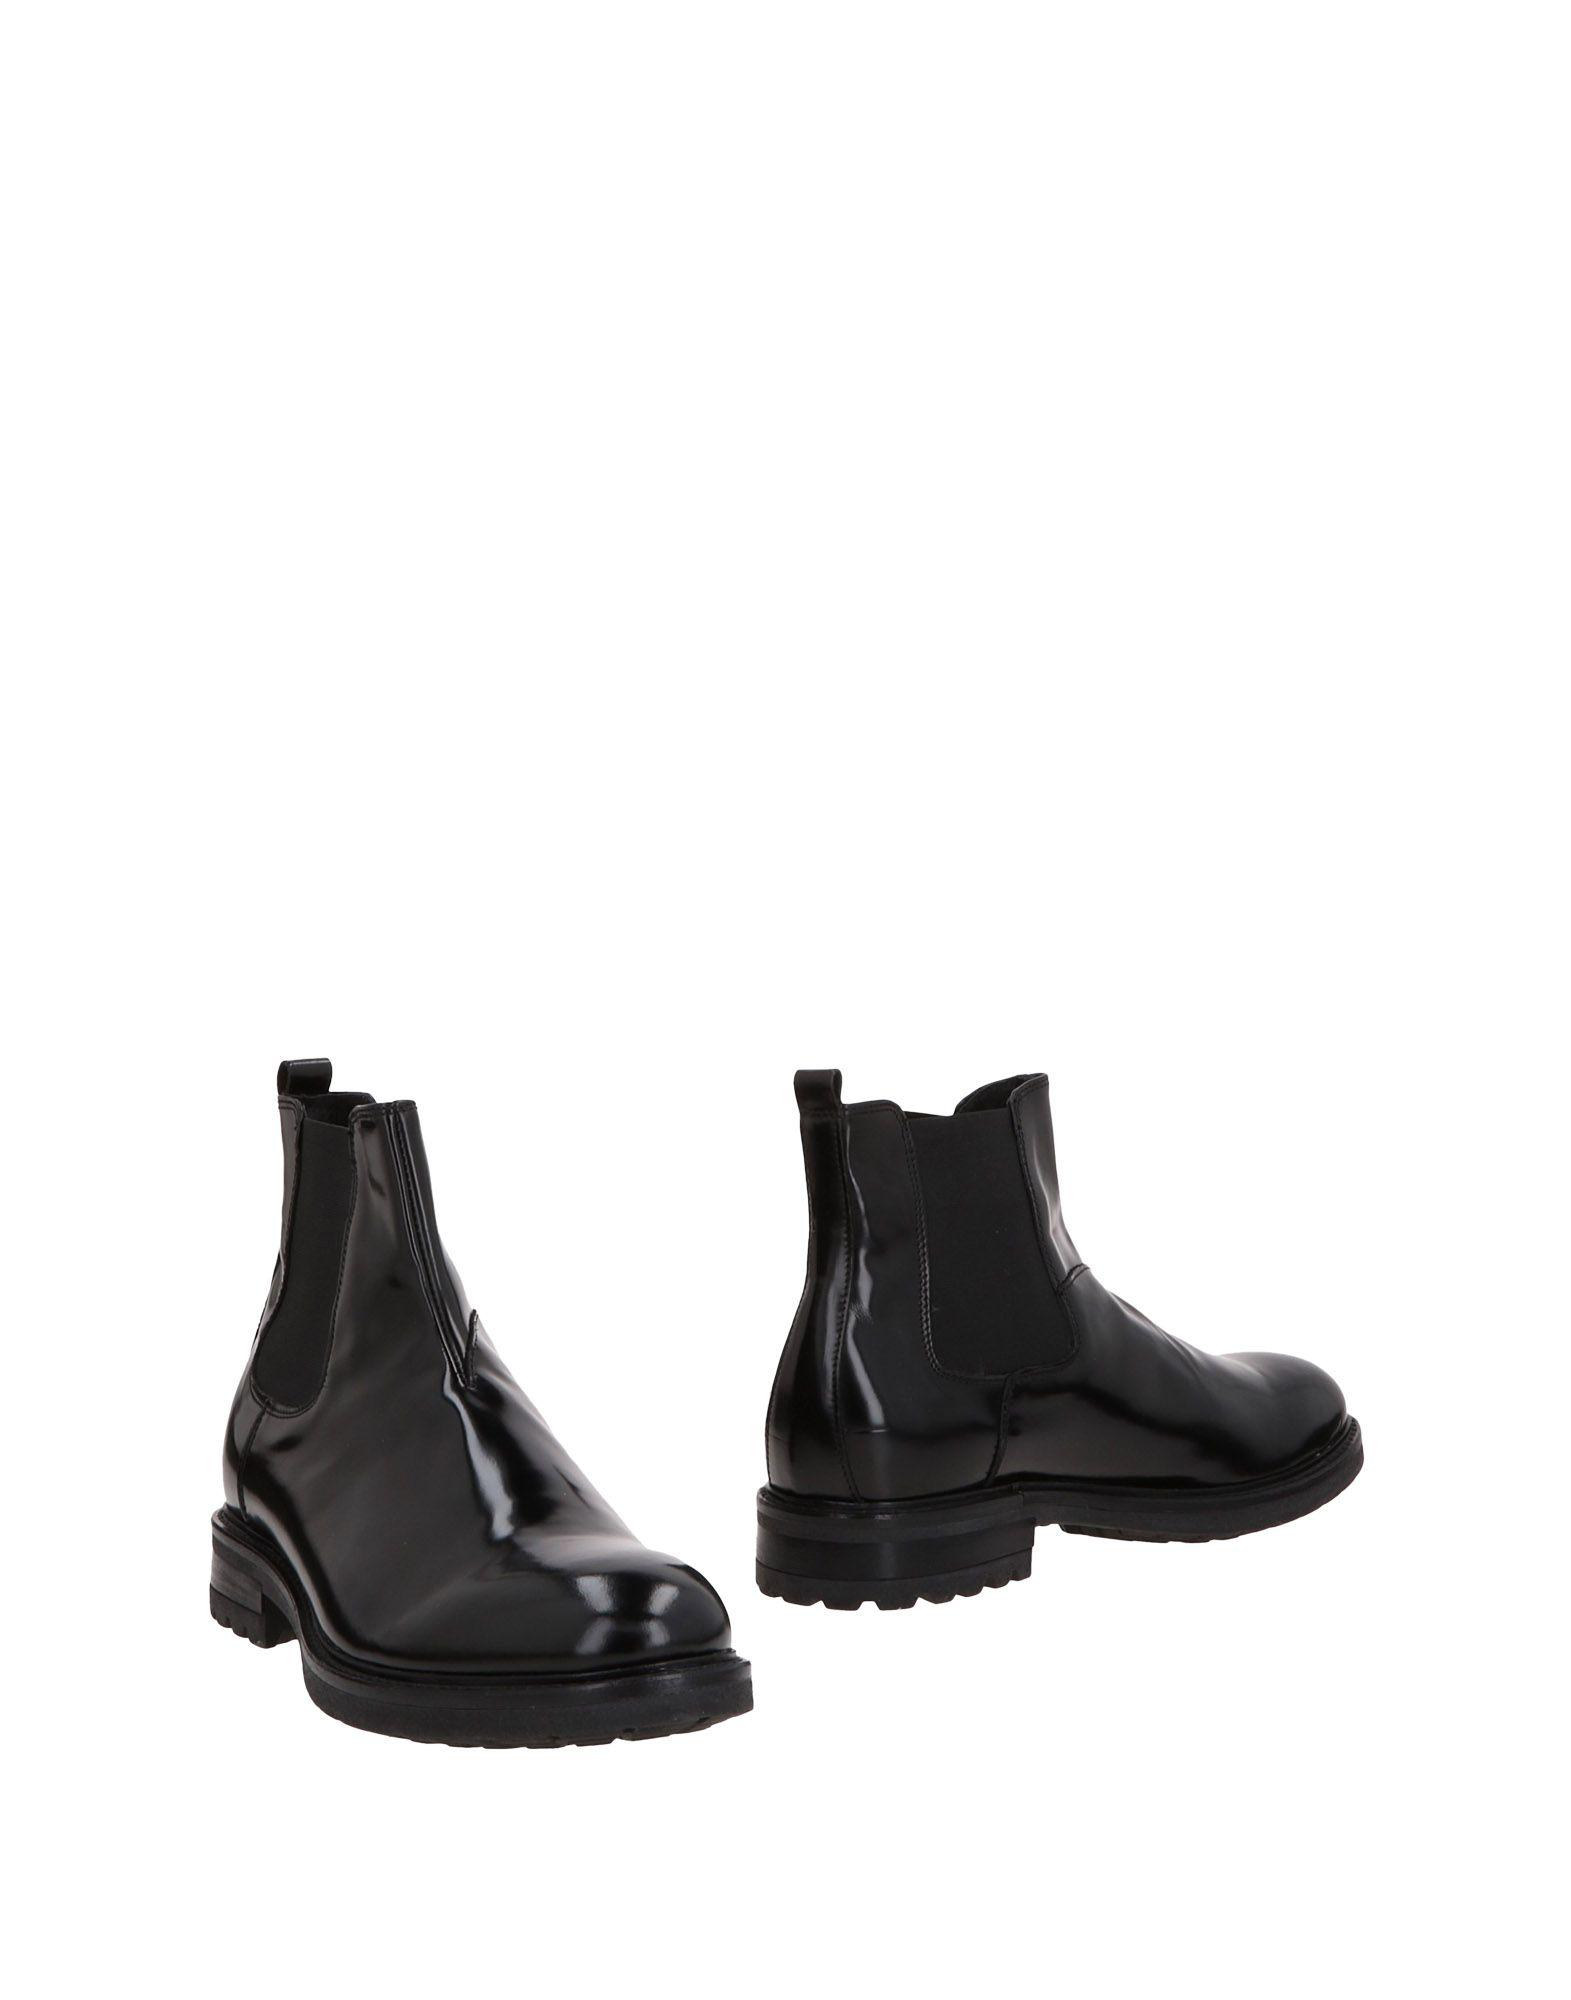 Haltbare Mode billige Schuhe Lea Lea Schuhe 11473286NO Beliebte Schuhe 8e3eb6